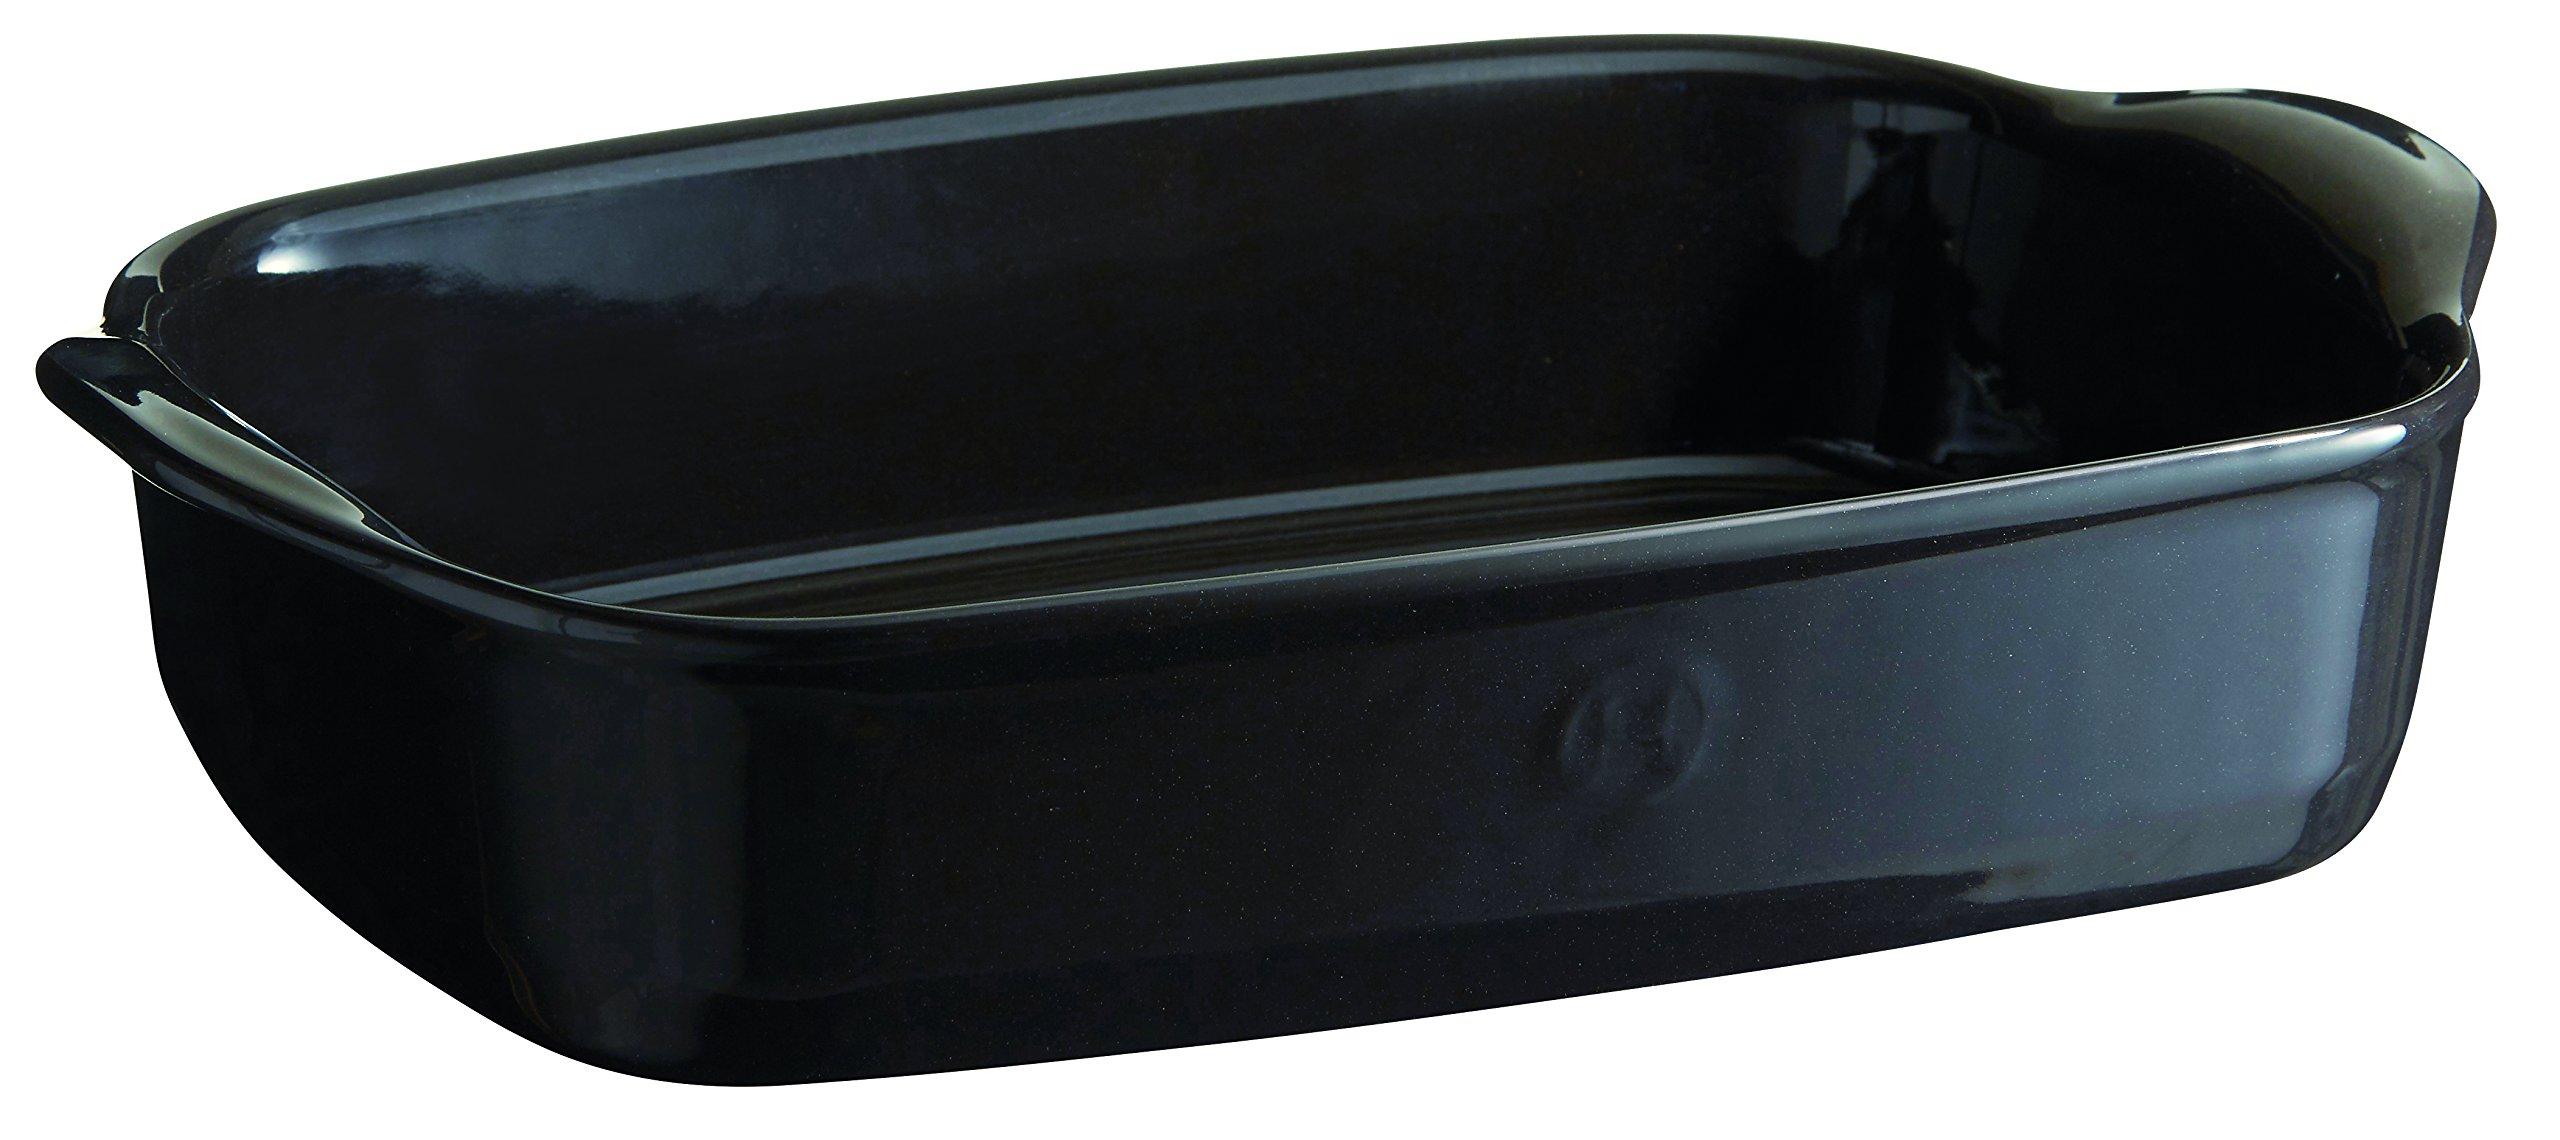 Emile Henry 799650 France Ovenware Ultime Rectangular Baking Dish, 11.4 x 7.5, Charcoal